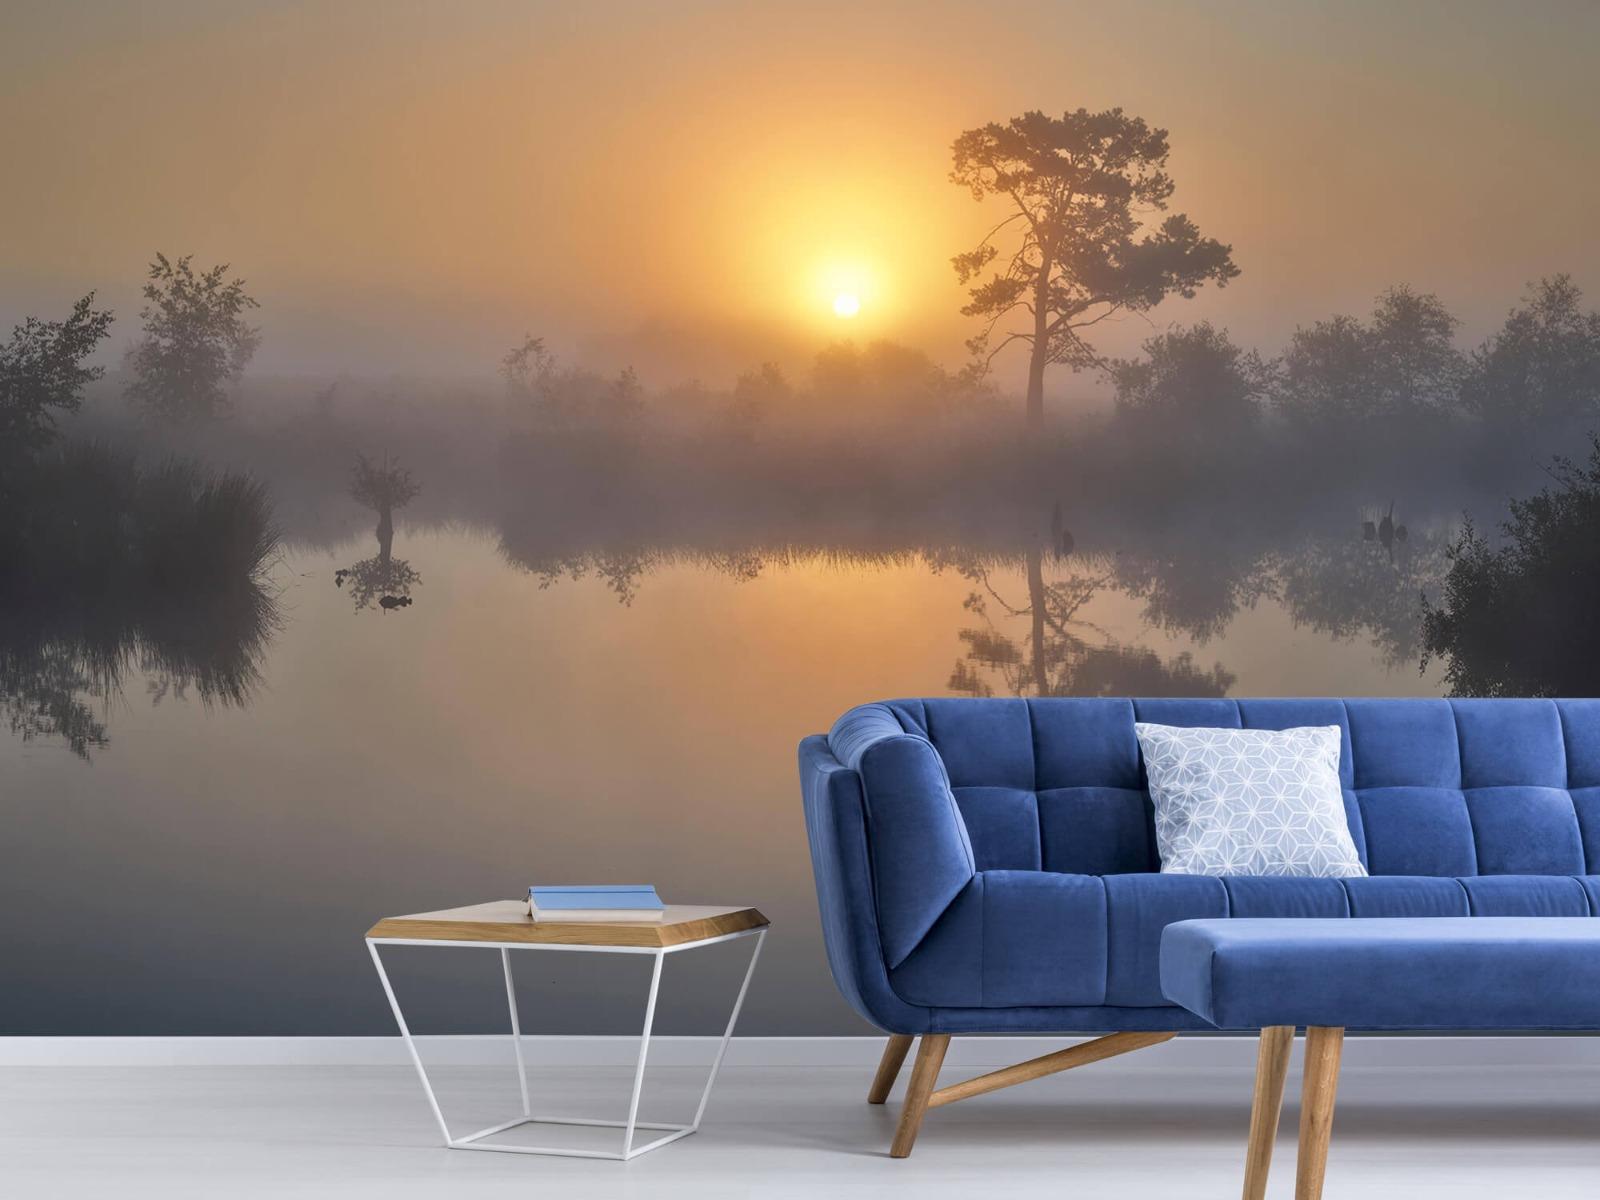 Natuur - Mistige zonsopkomst 6